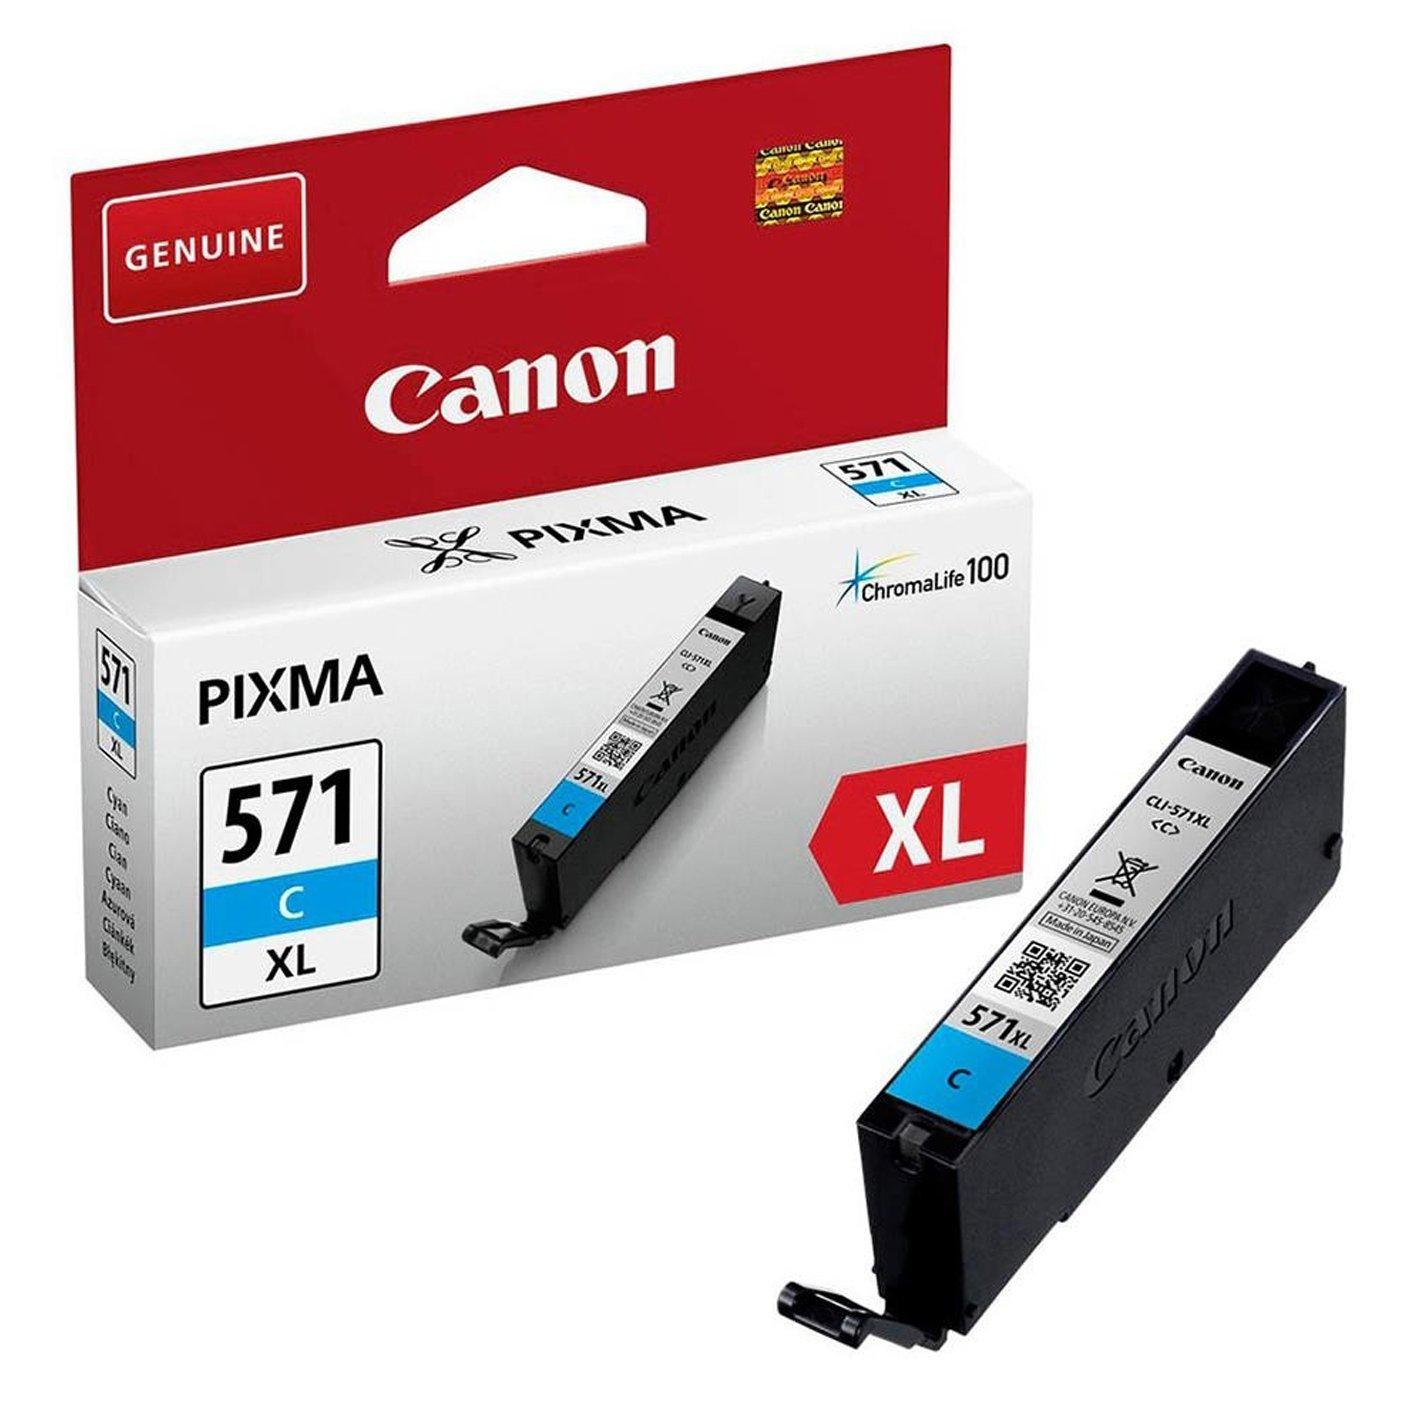 Amazon.com: CANON Standard CLI-571XL Ink Cartridge